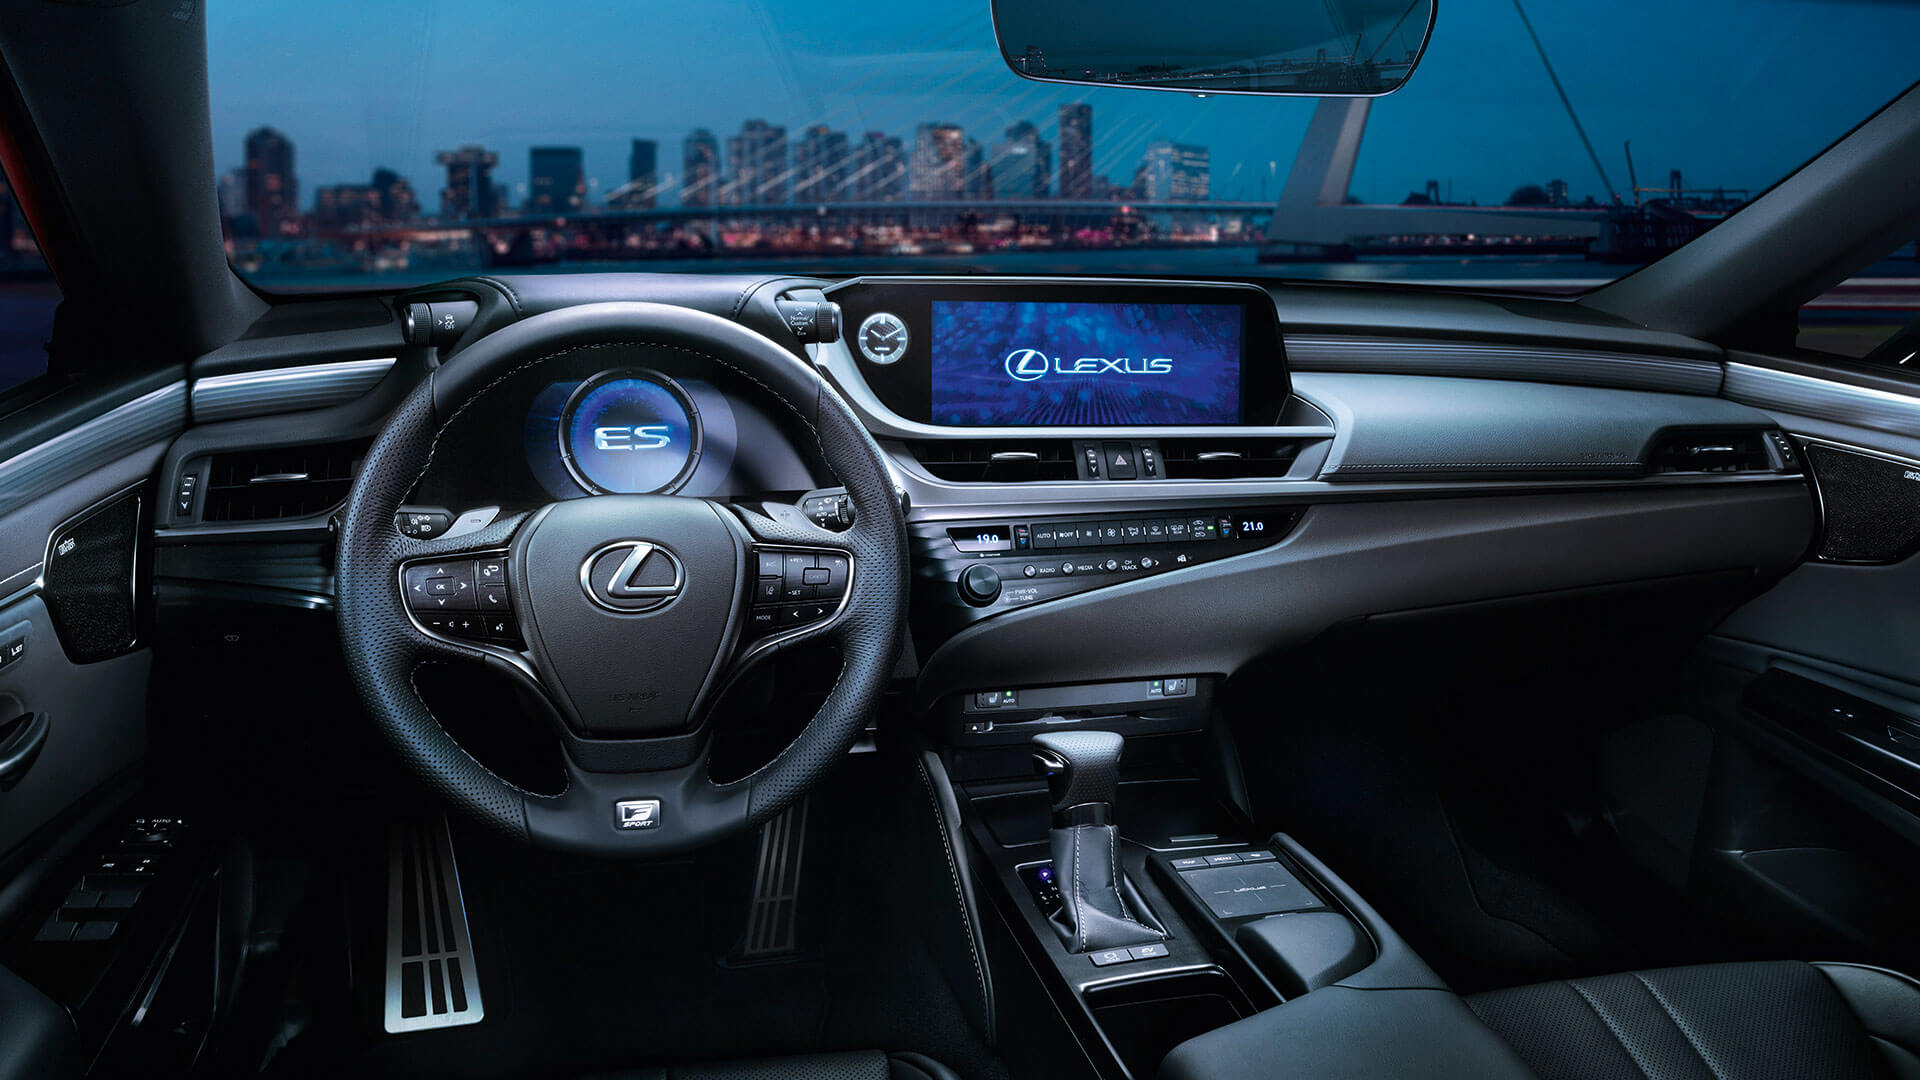 2019 Lexus Es Hybrid Gallery 005 Interior